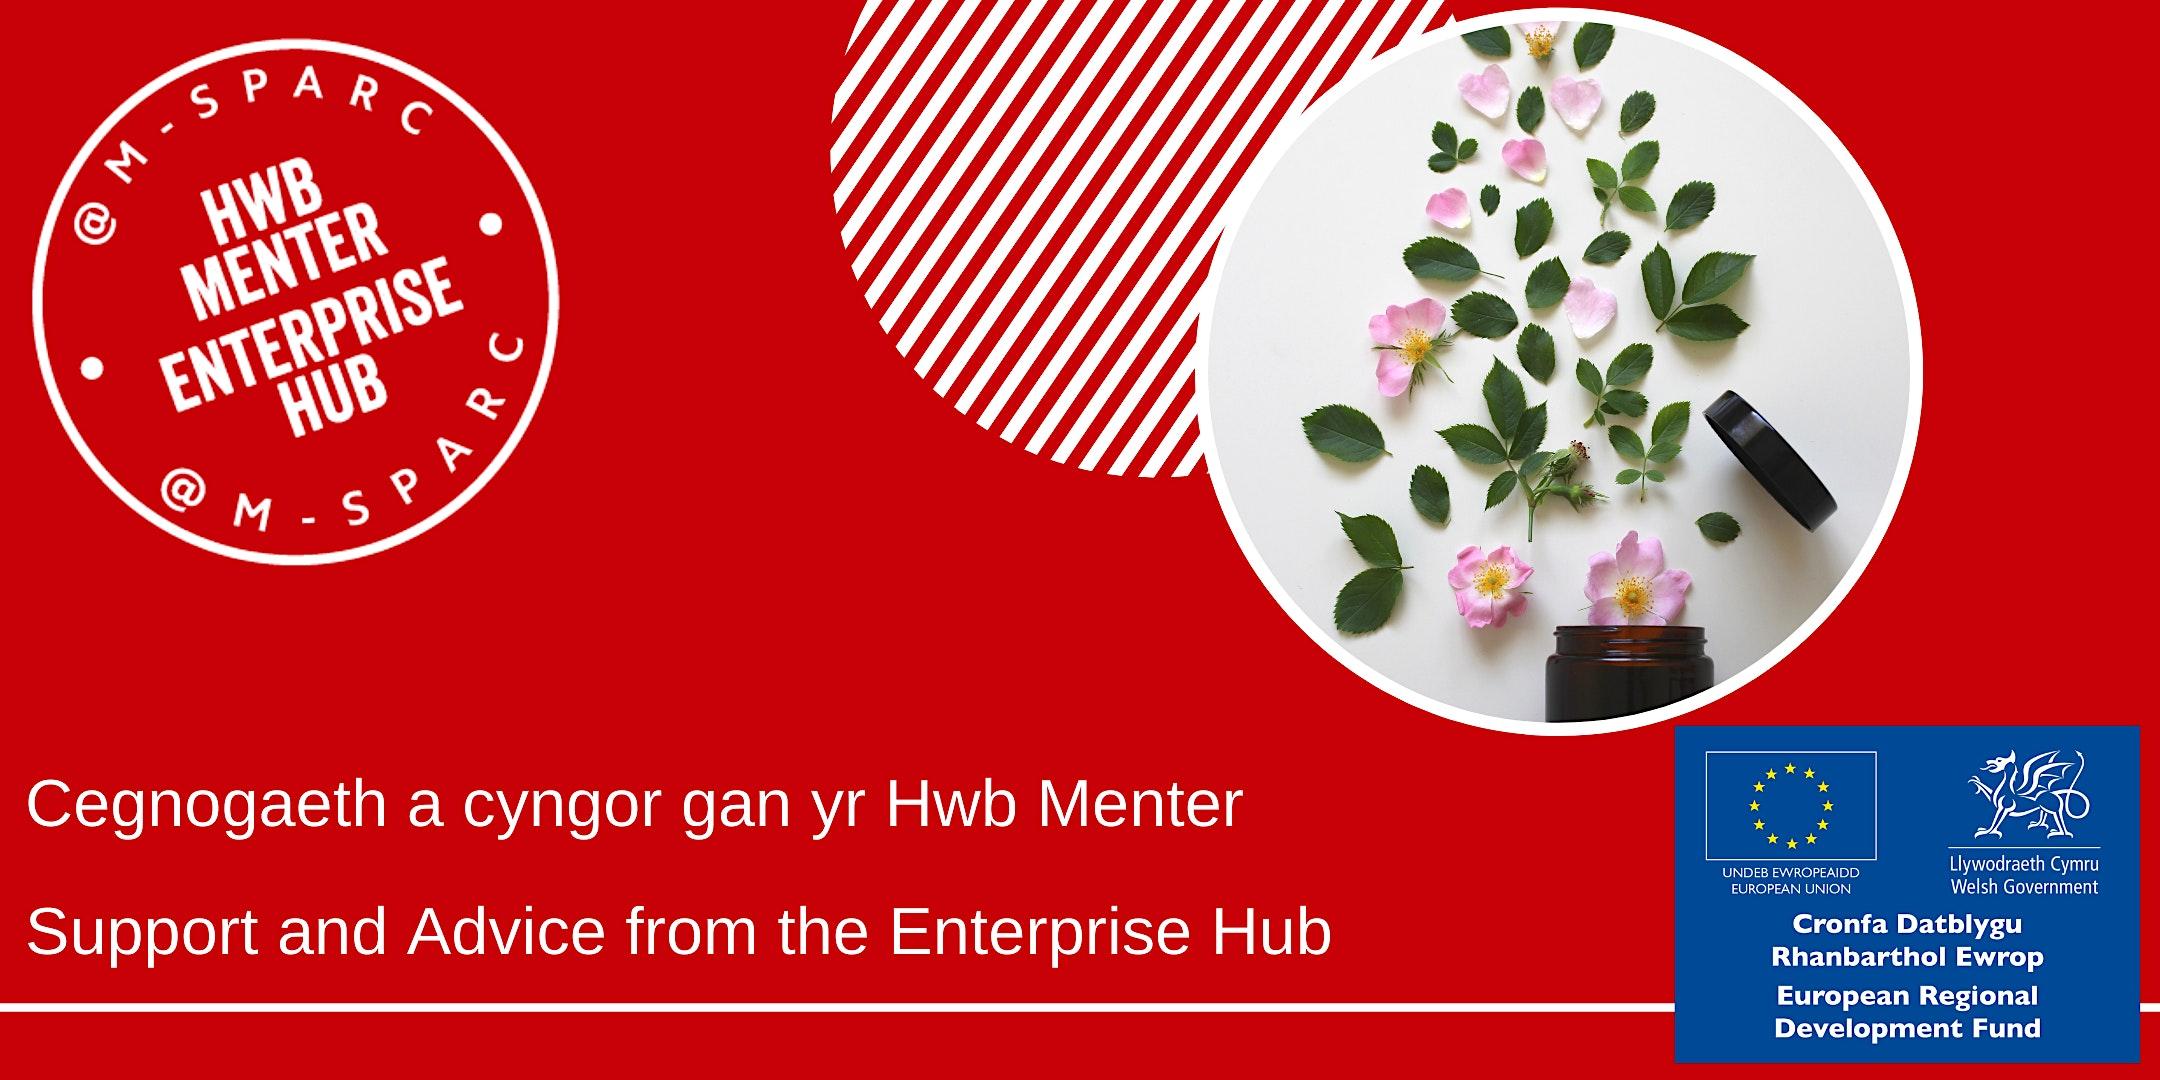 Cymorth gan yr Hwb Menter - Support from the Enterprise Hub